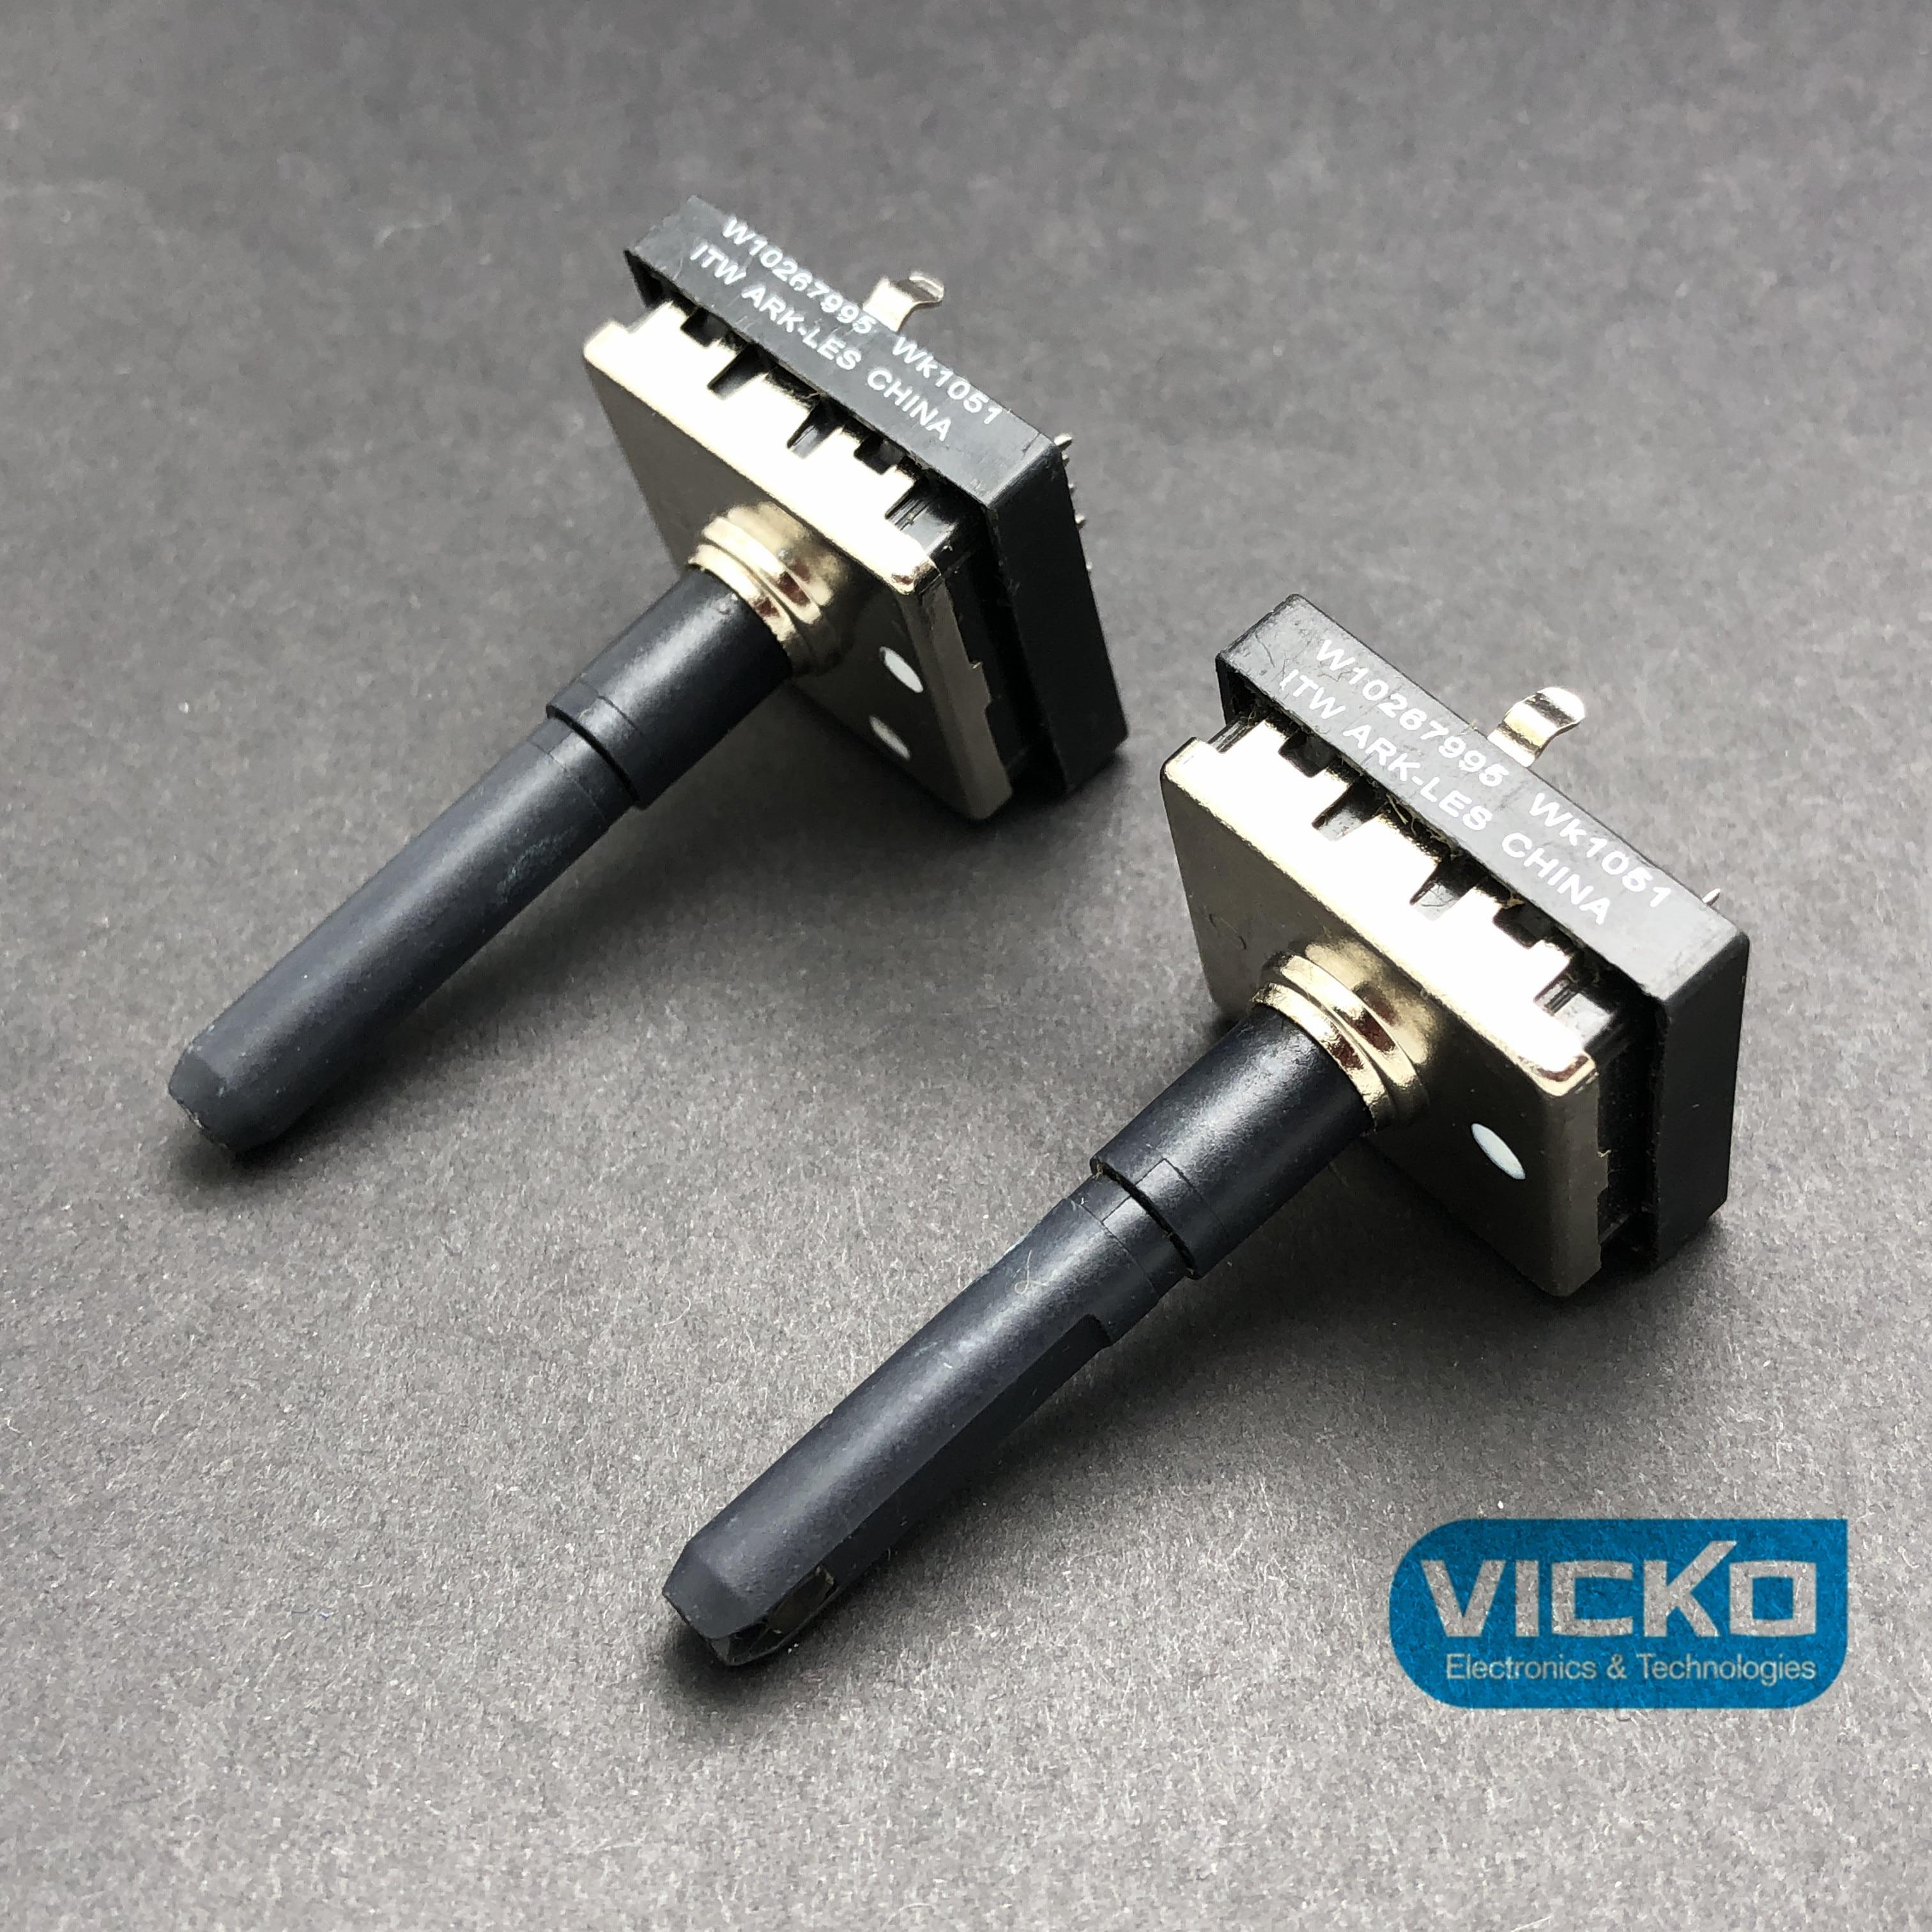 YK ITW ARK LES W10267995 WK1051 7 foot step 12 point encoder handle length 40MM